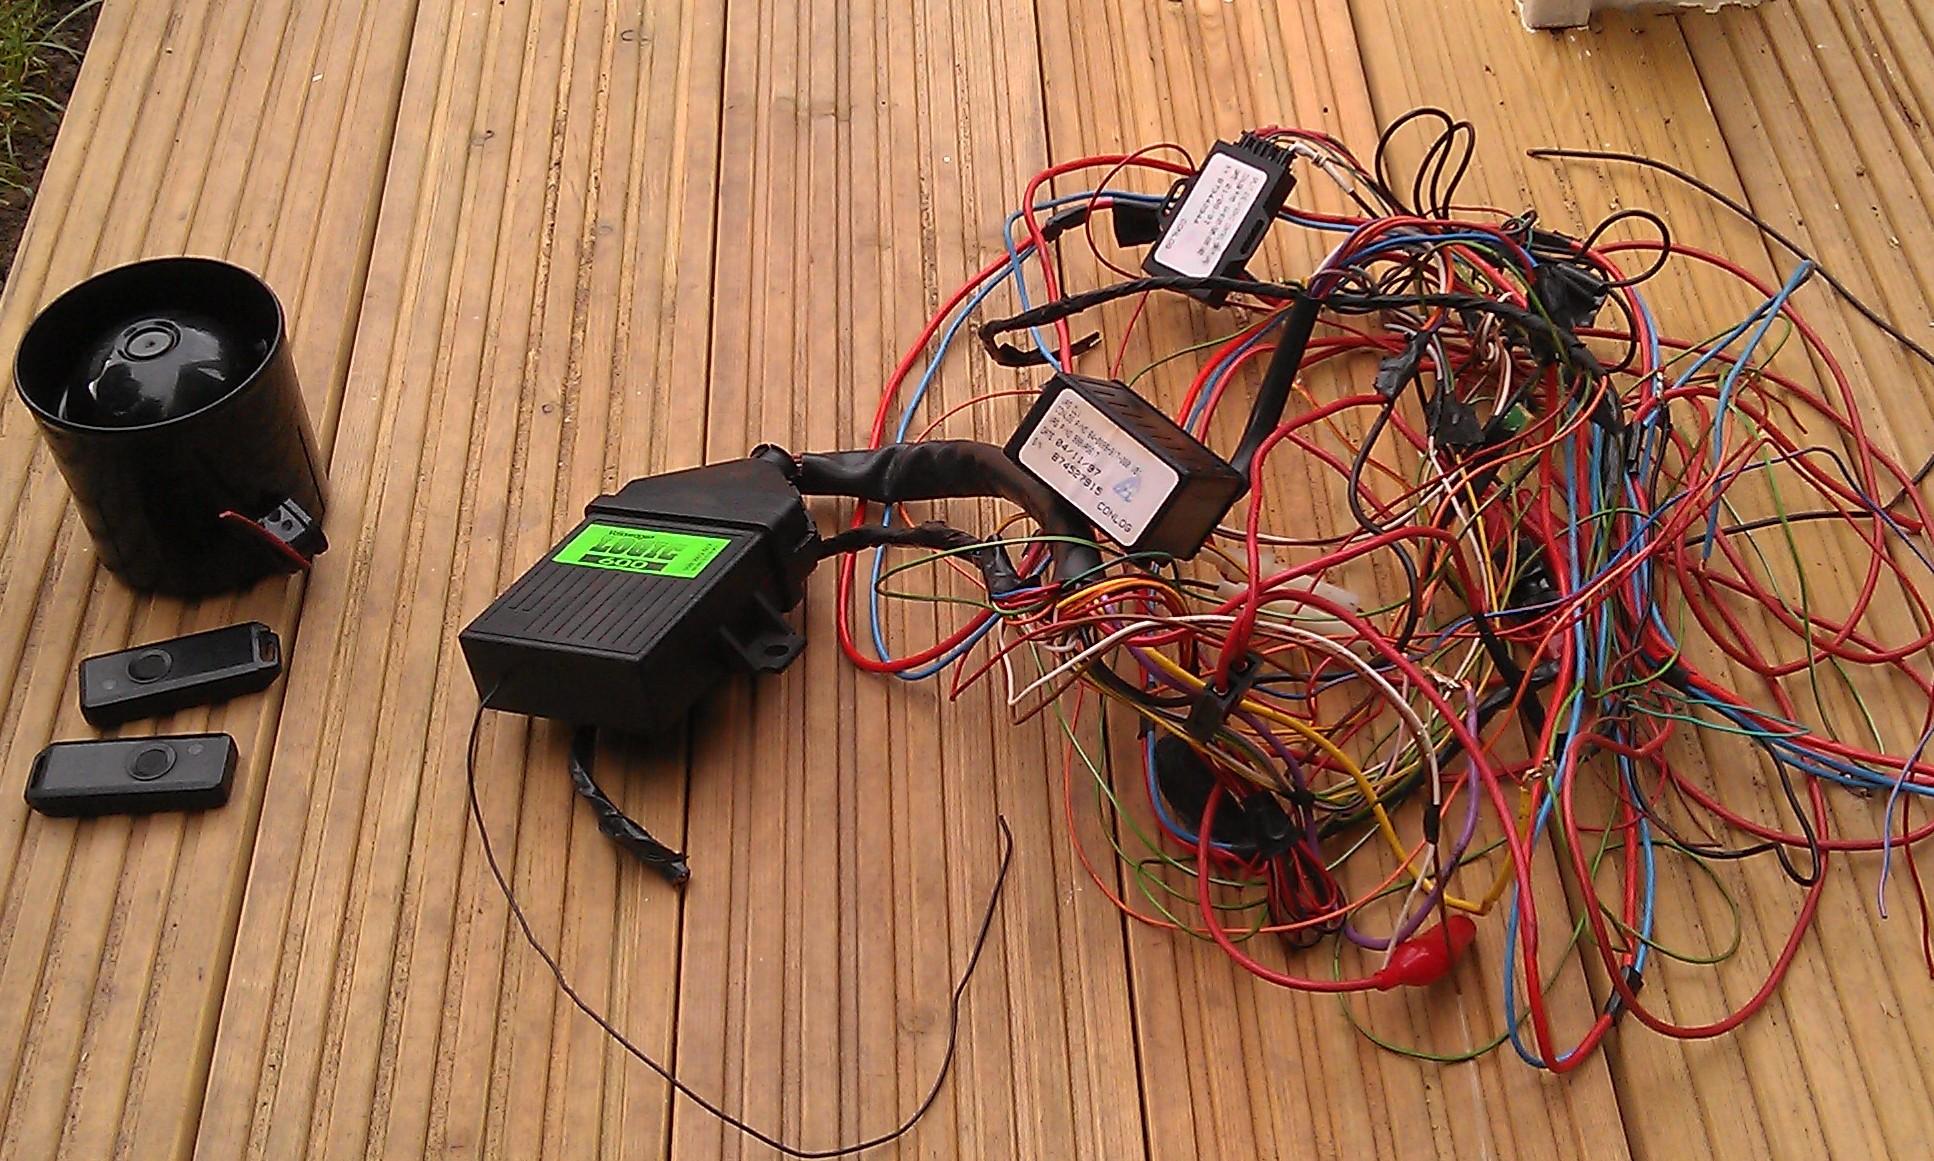 Car Alarm Wiring Diagrams Car Alarm Car Alarm Wiring Diagrams Best